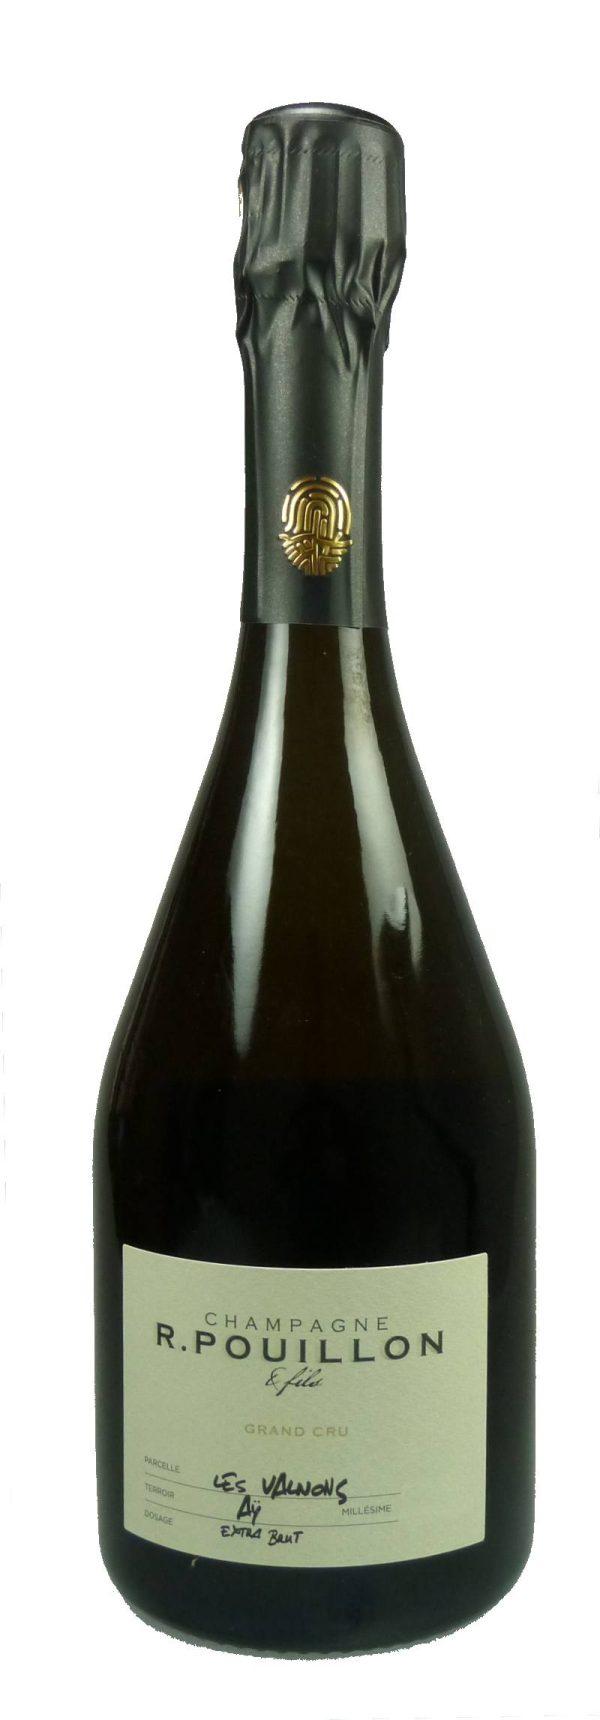 Les Valnons Champagne Extra Brut Grand Cru  2010